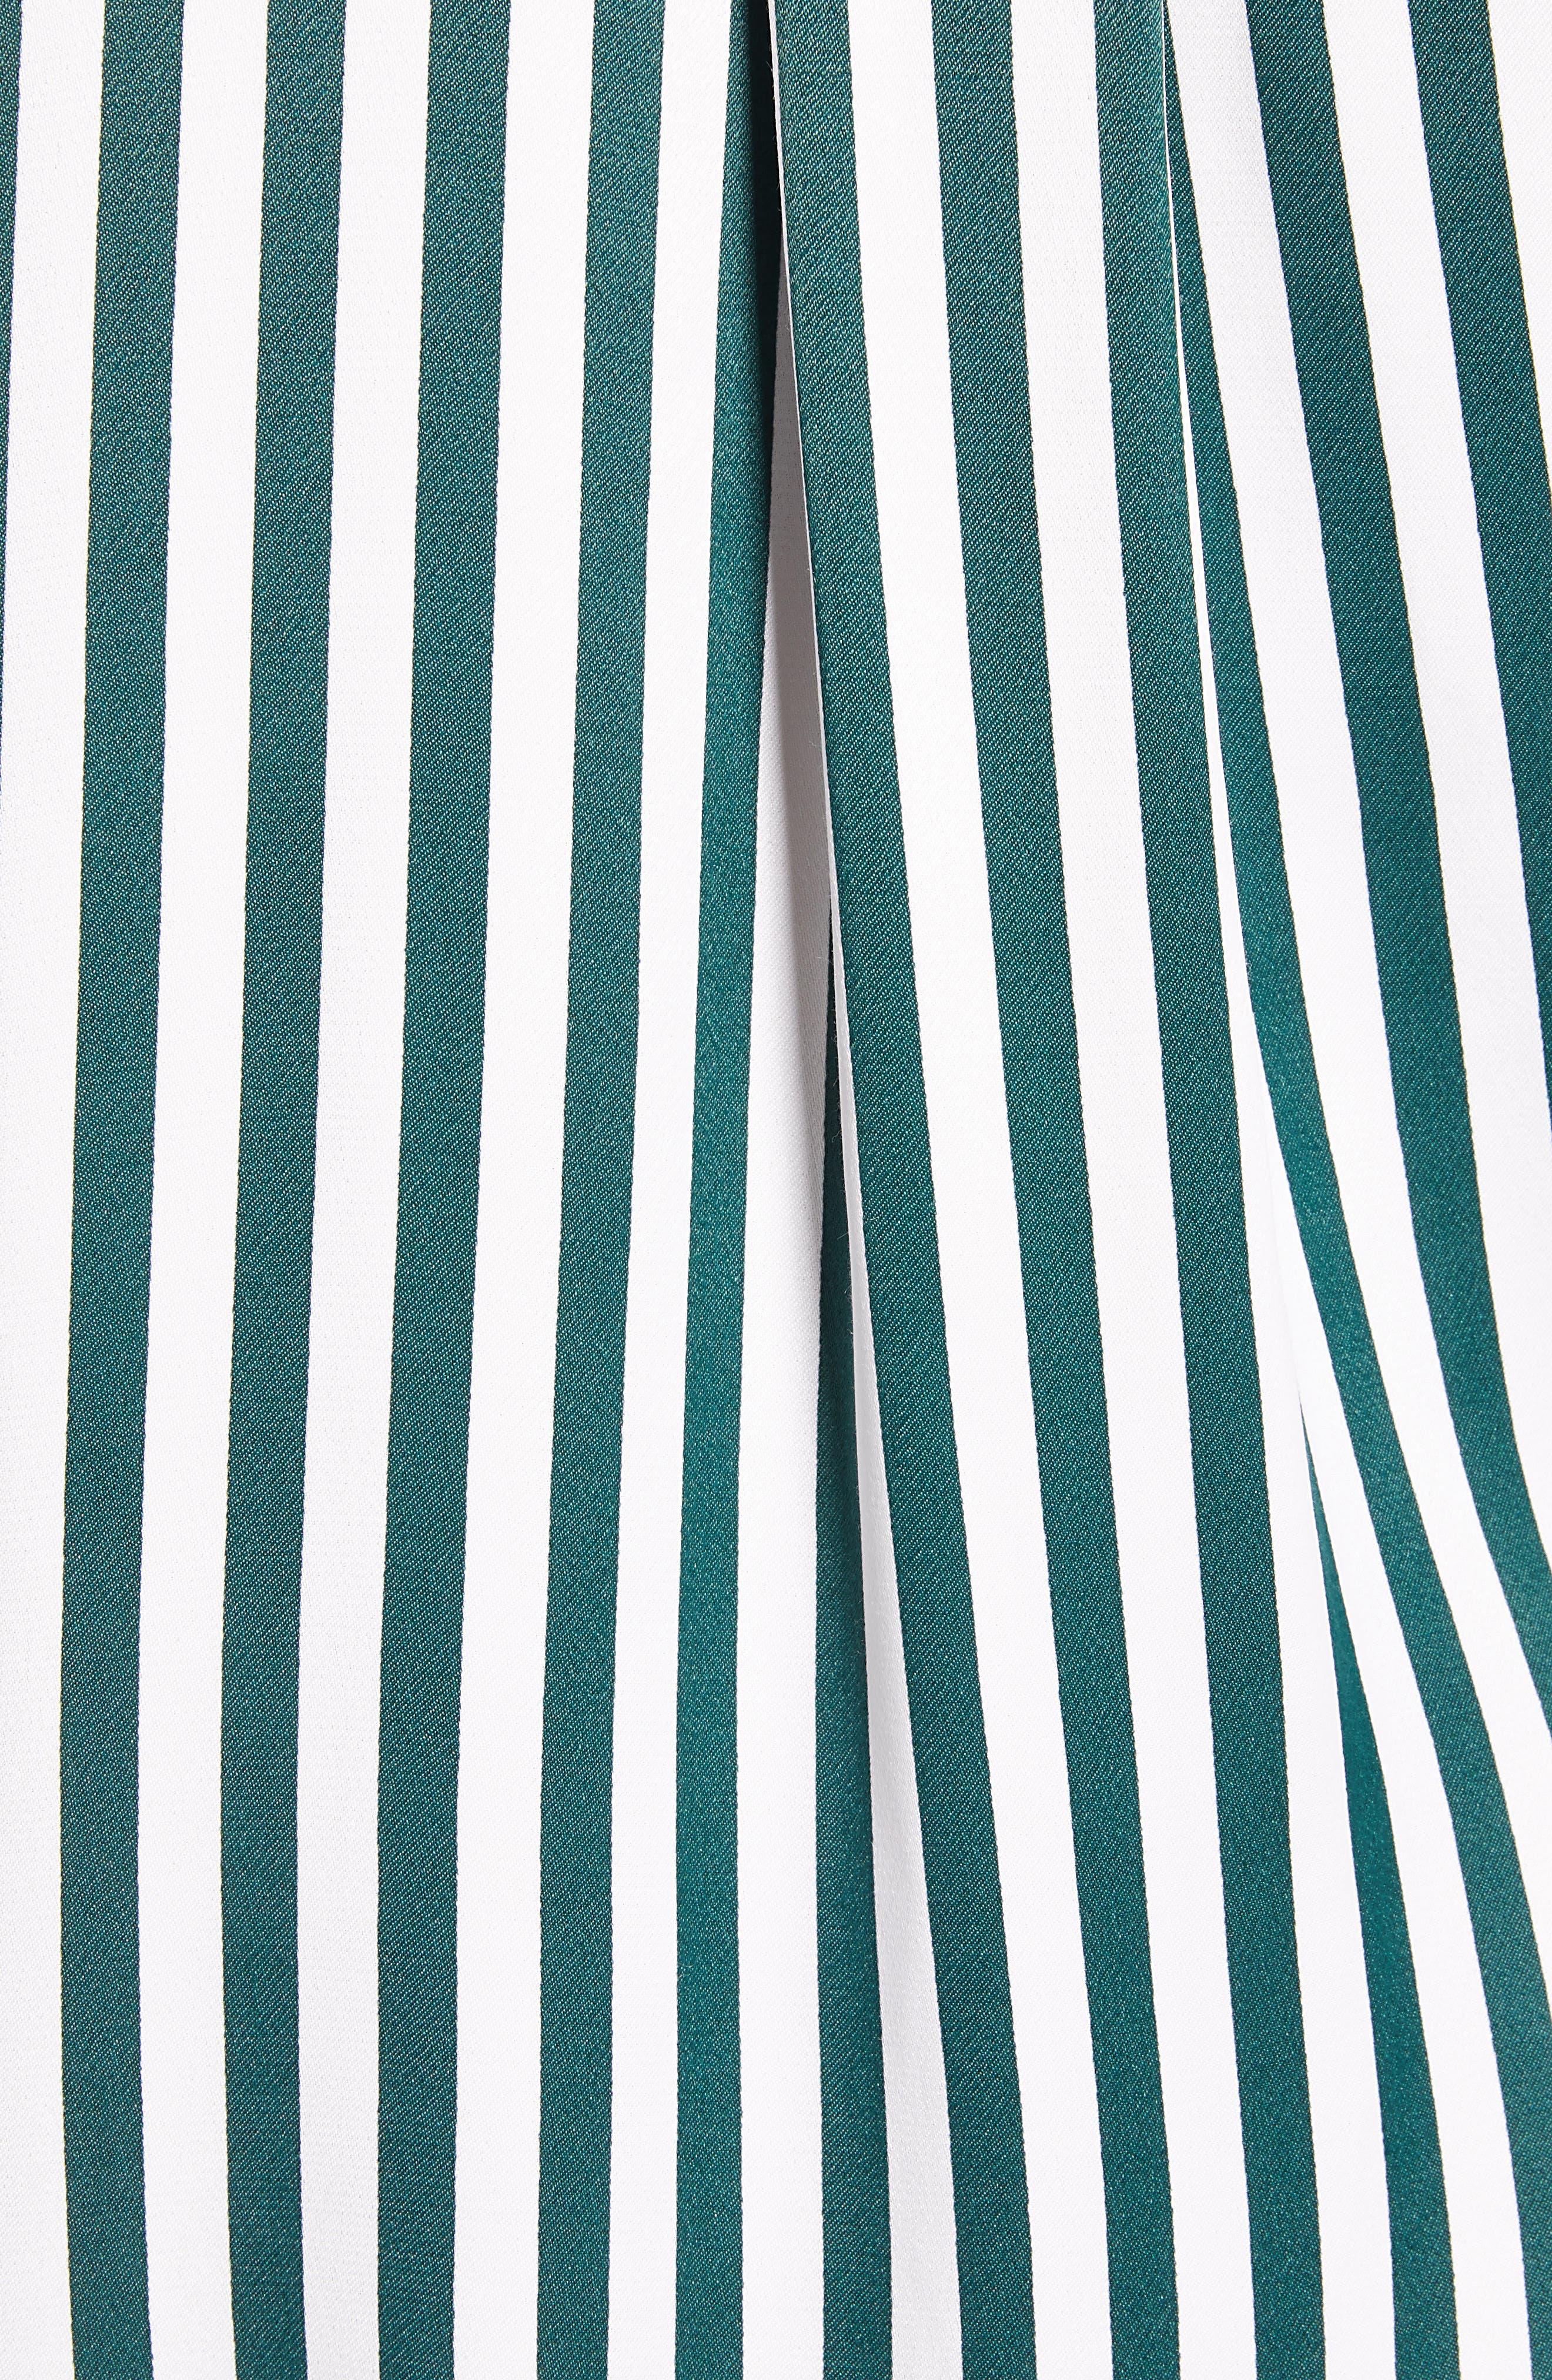 Striped Boyfriend Shirt,                             Alternate thumbnail 5, color,                             GREEN BUG WIDE STRIPE